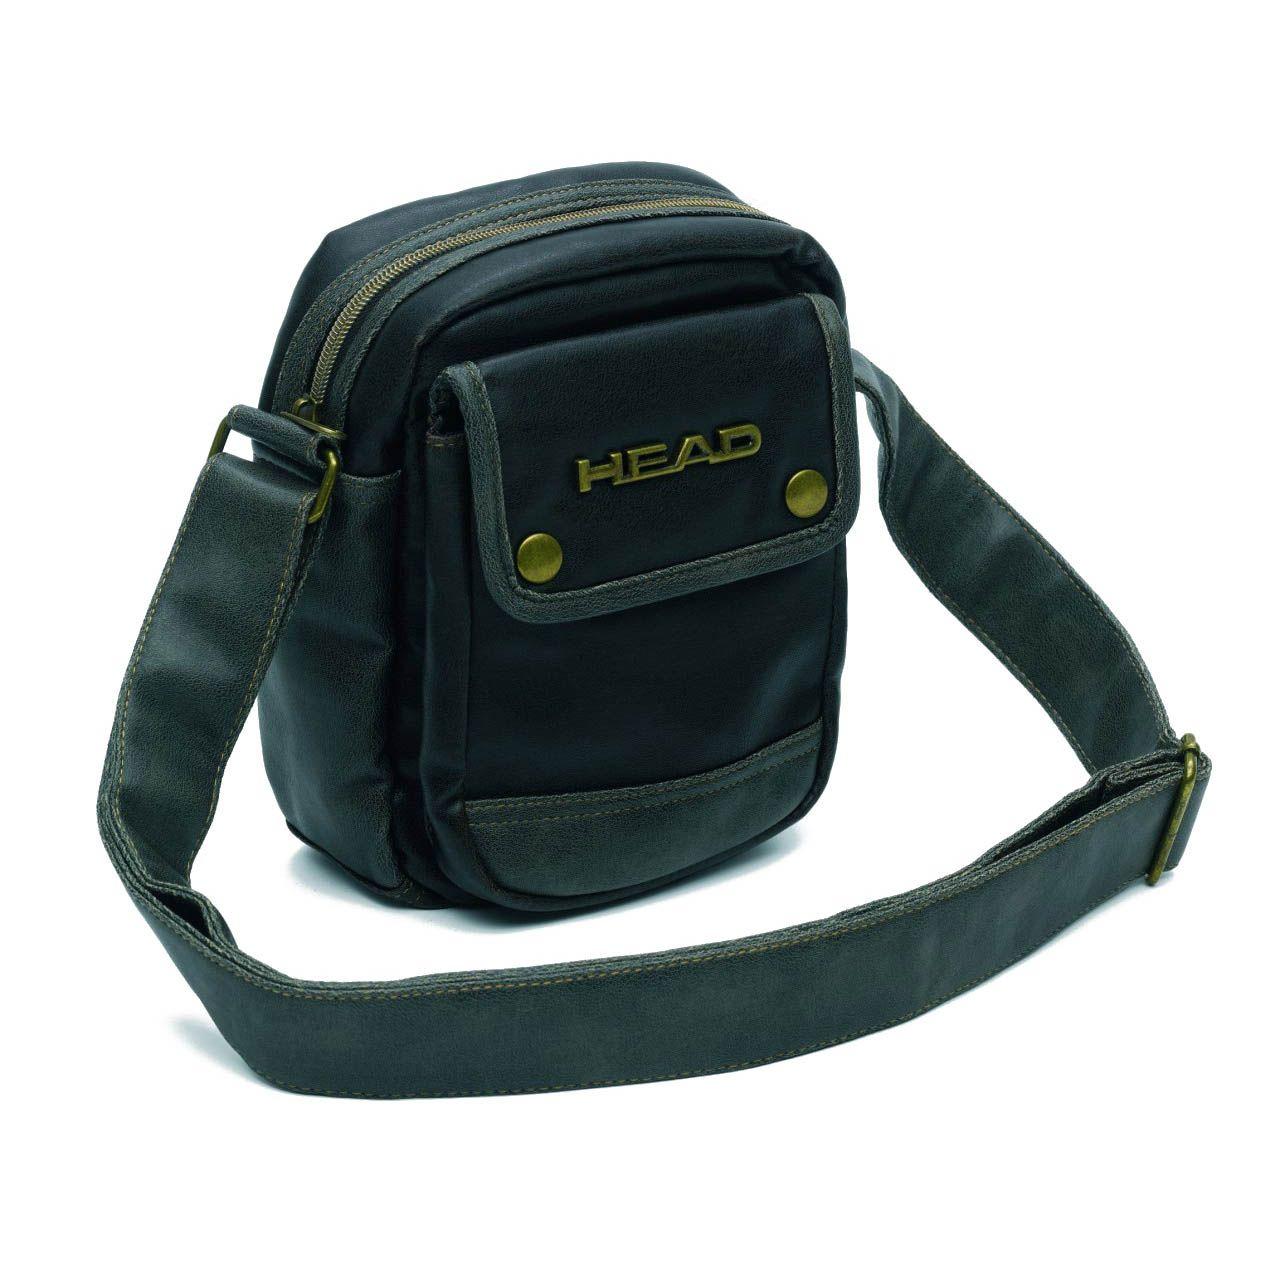 Head Travel Small Shoulder Bag Sweatband Com